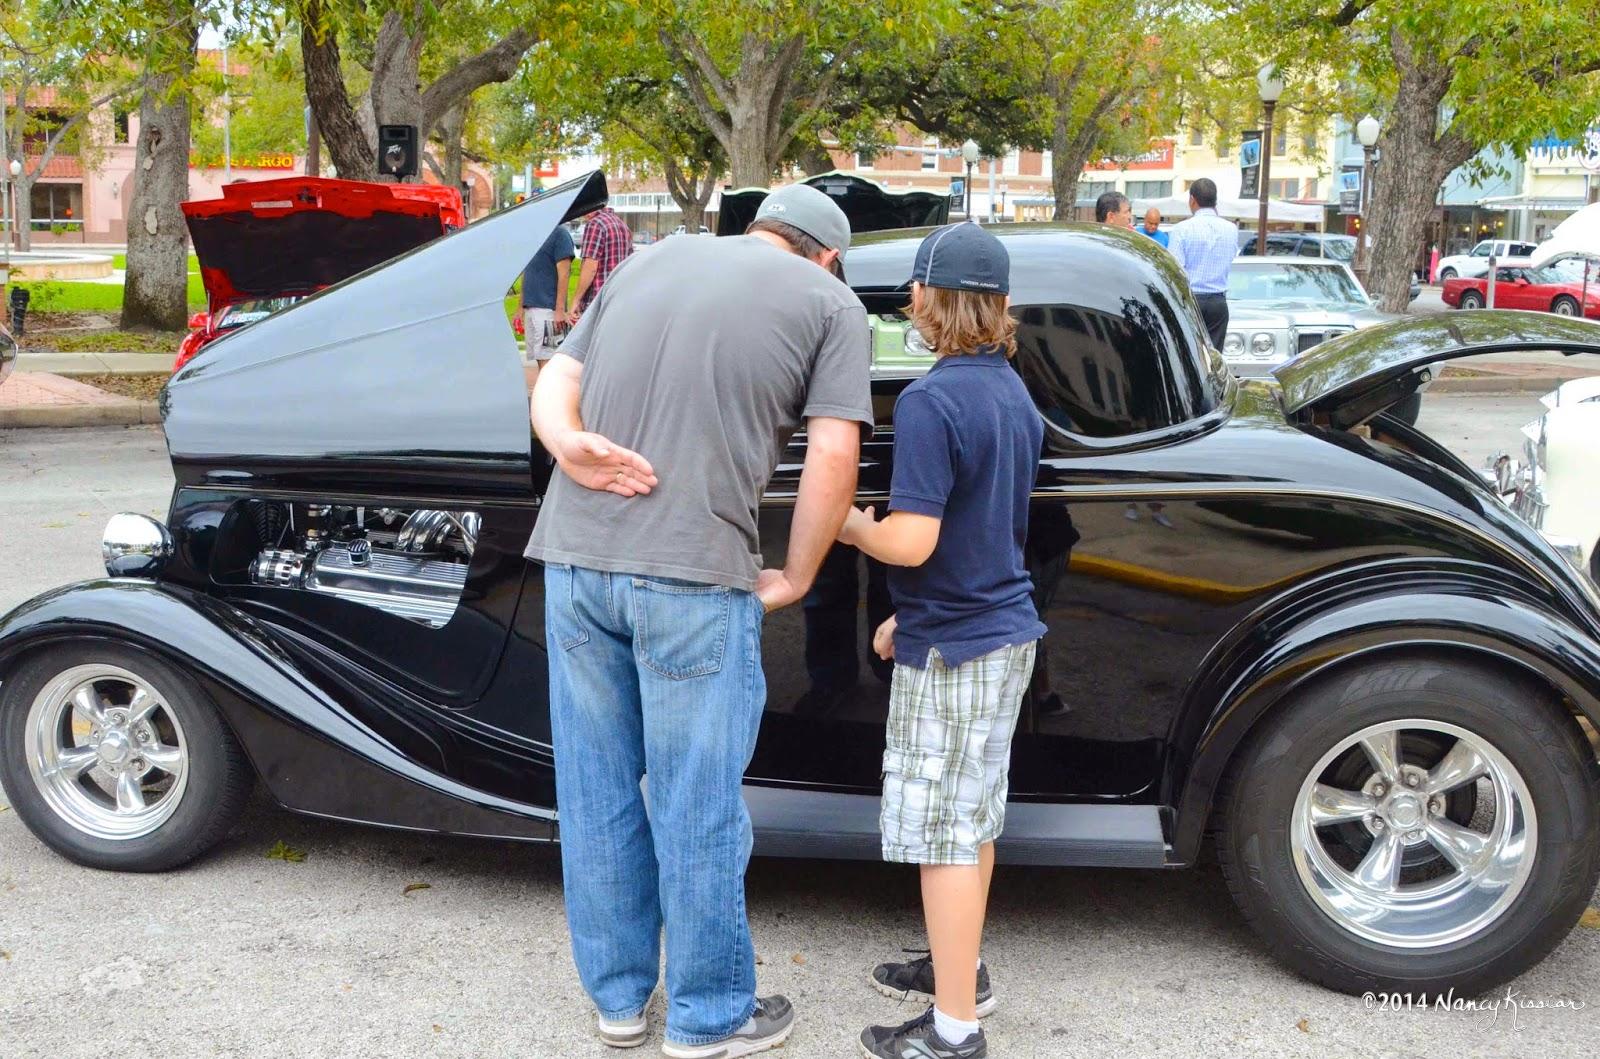 Wild About Texas: Pontiac Club Classic Car Show Delights Seguinites